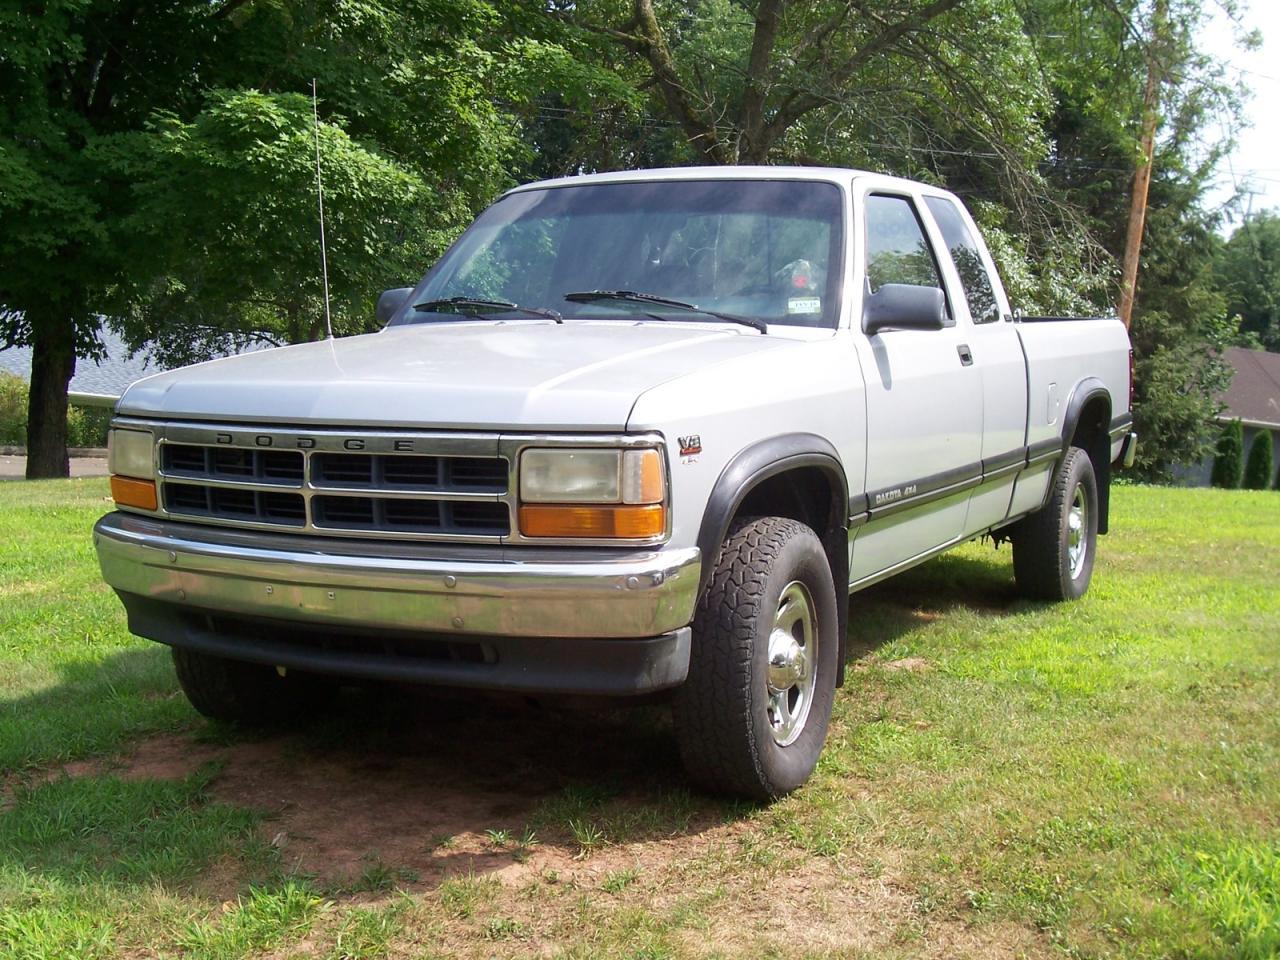 1995 Dodge Dakota Information And Photos Zomb Drive